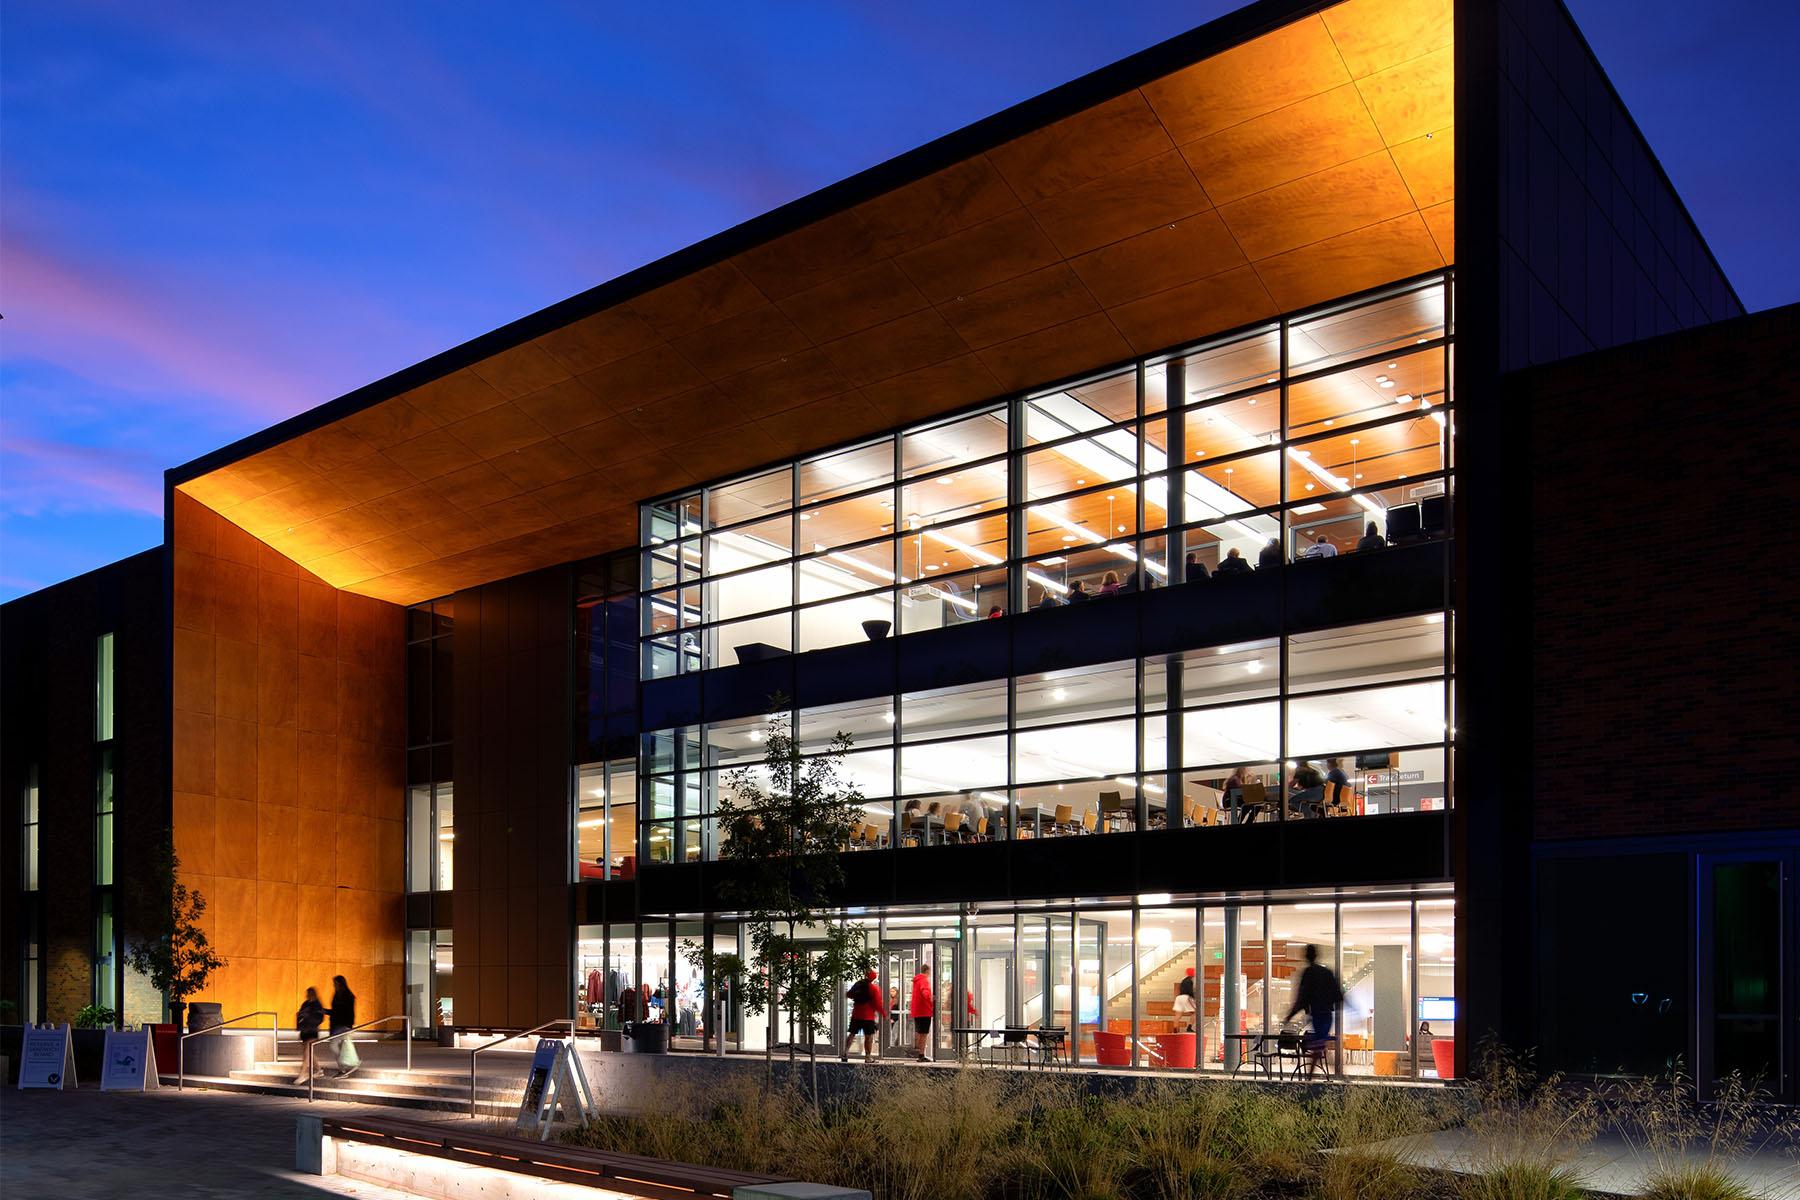 Eastern Washington University <br/> Pence Union Building